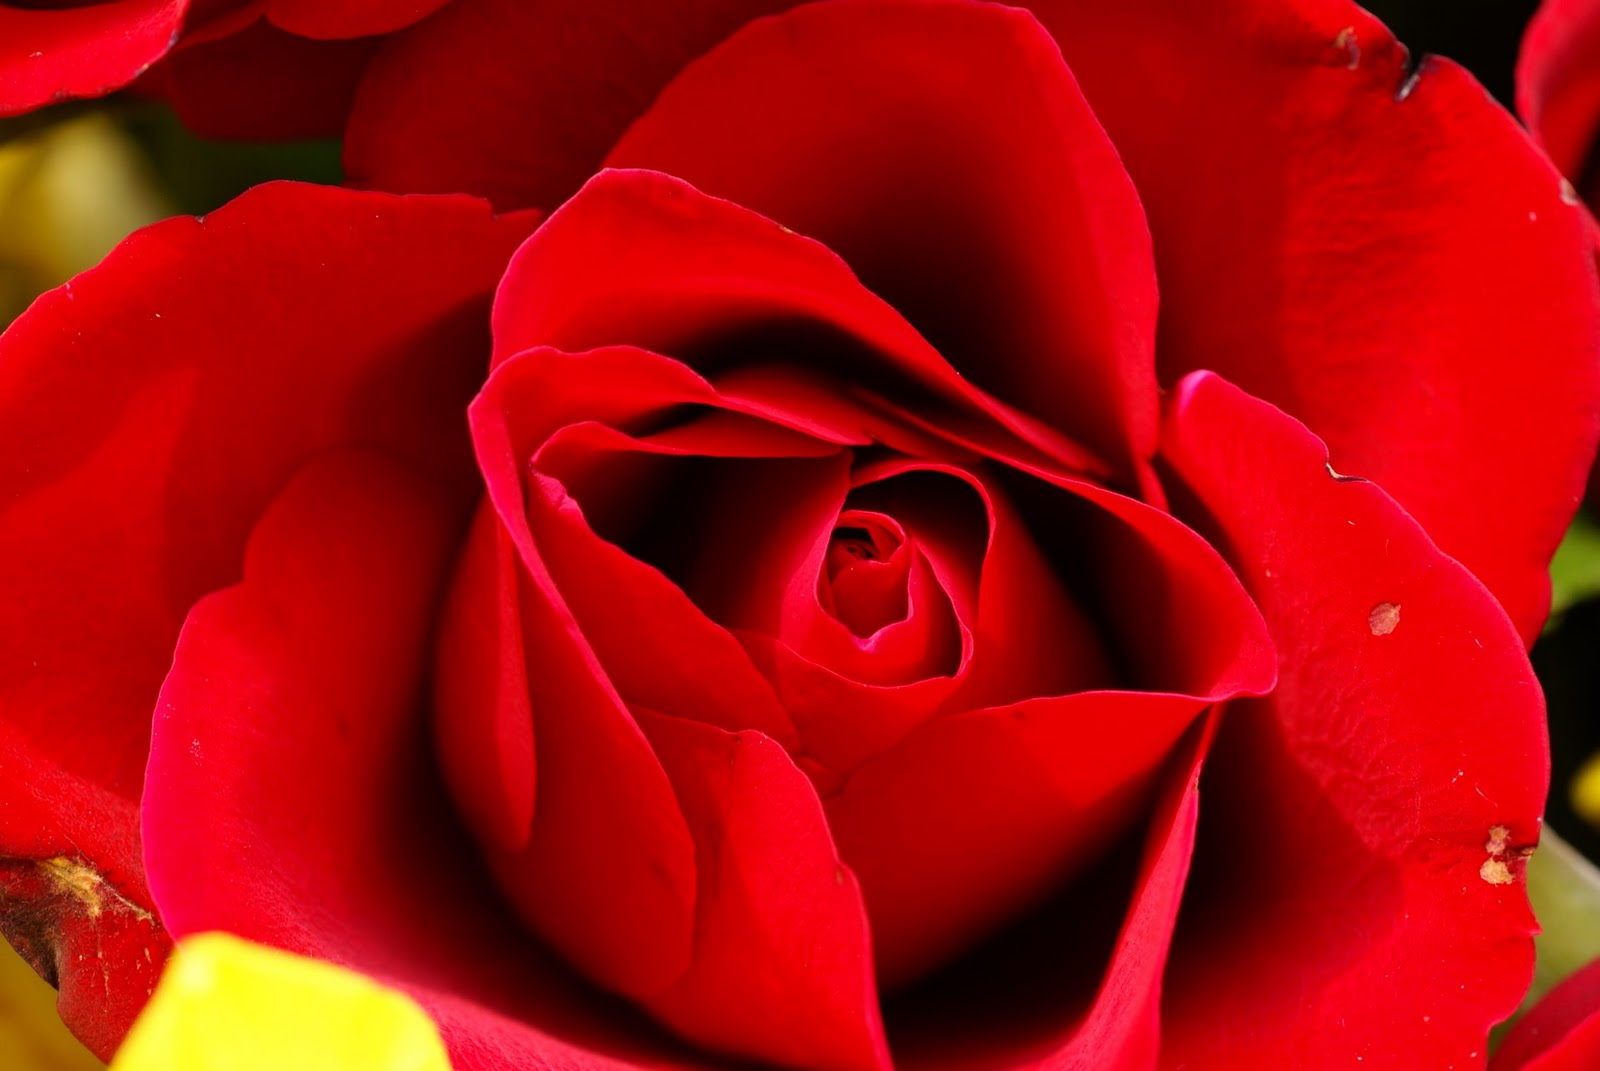 beautiful rose flower wallpaper,flower,petal,garden roses,red,flowering plant